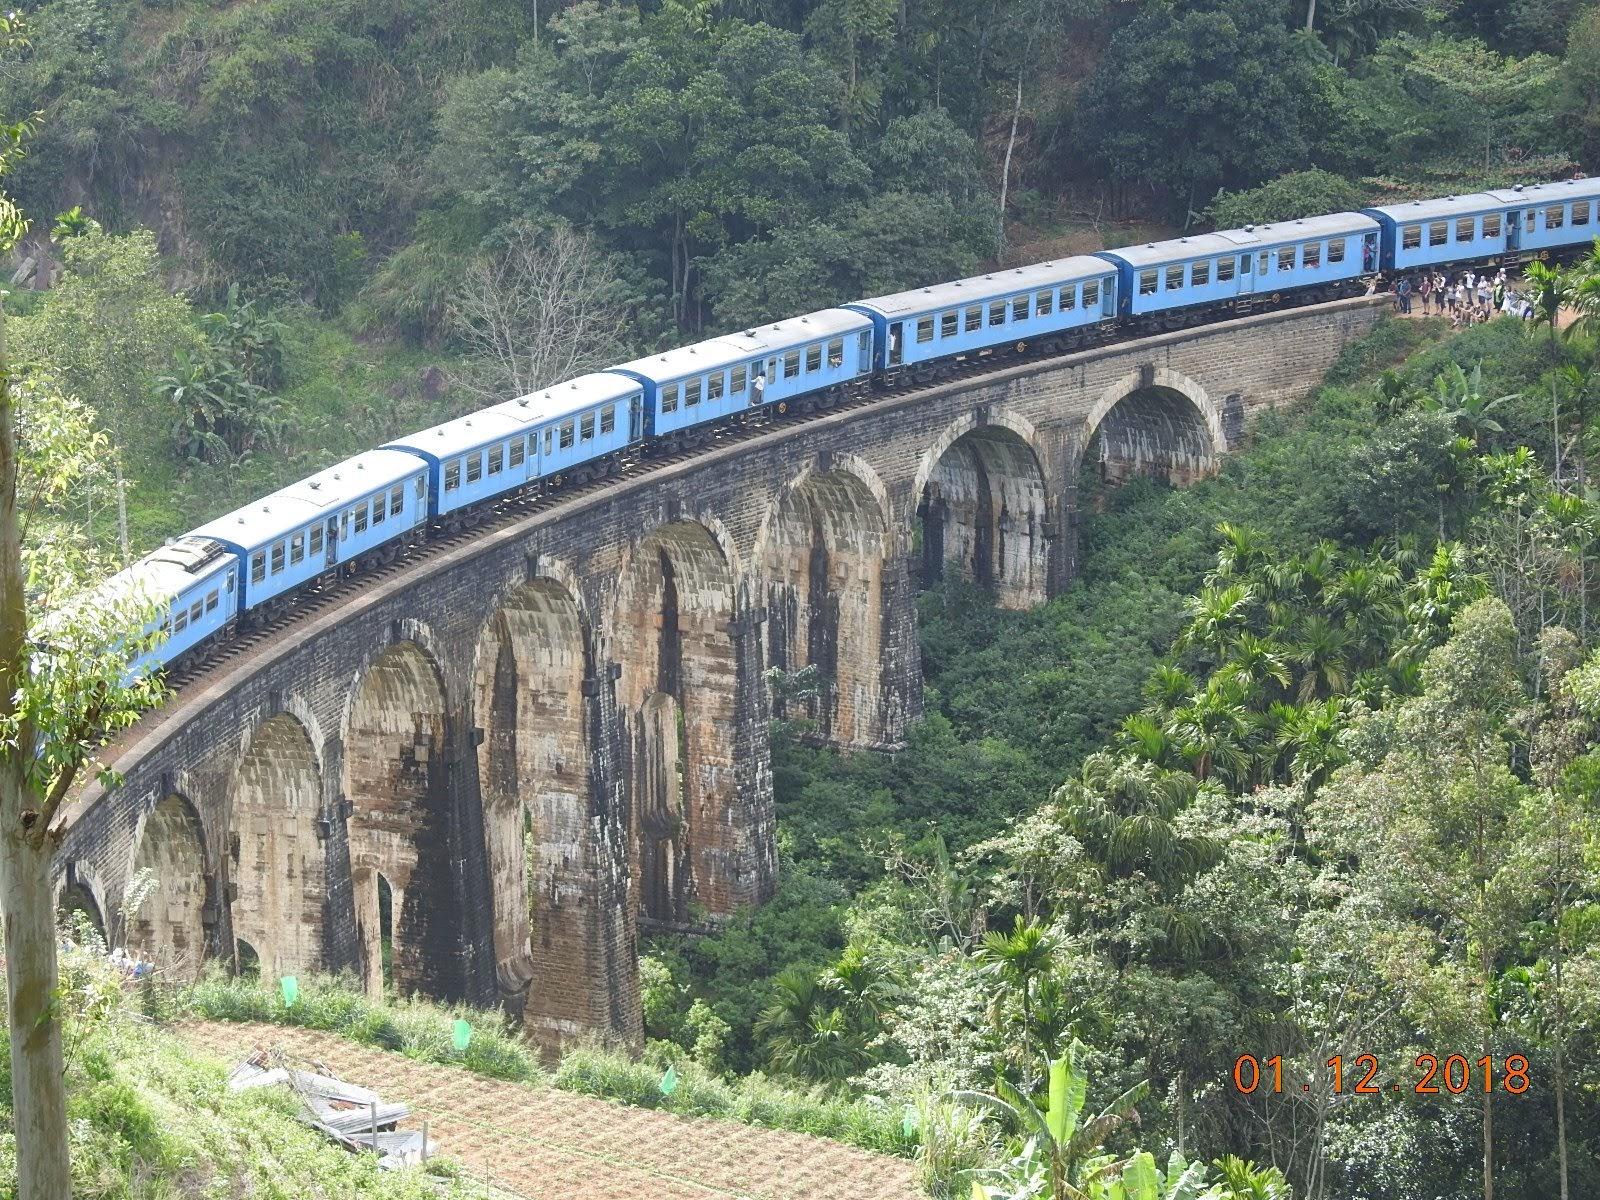 invite-to-paradise-sri-lanka-maldives-holiday-specialists-nutan-vidyut-patel-train.jpg